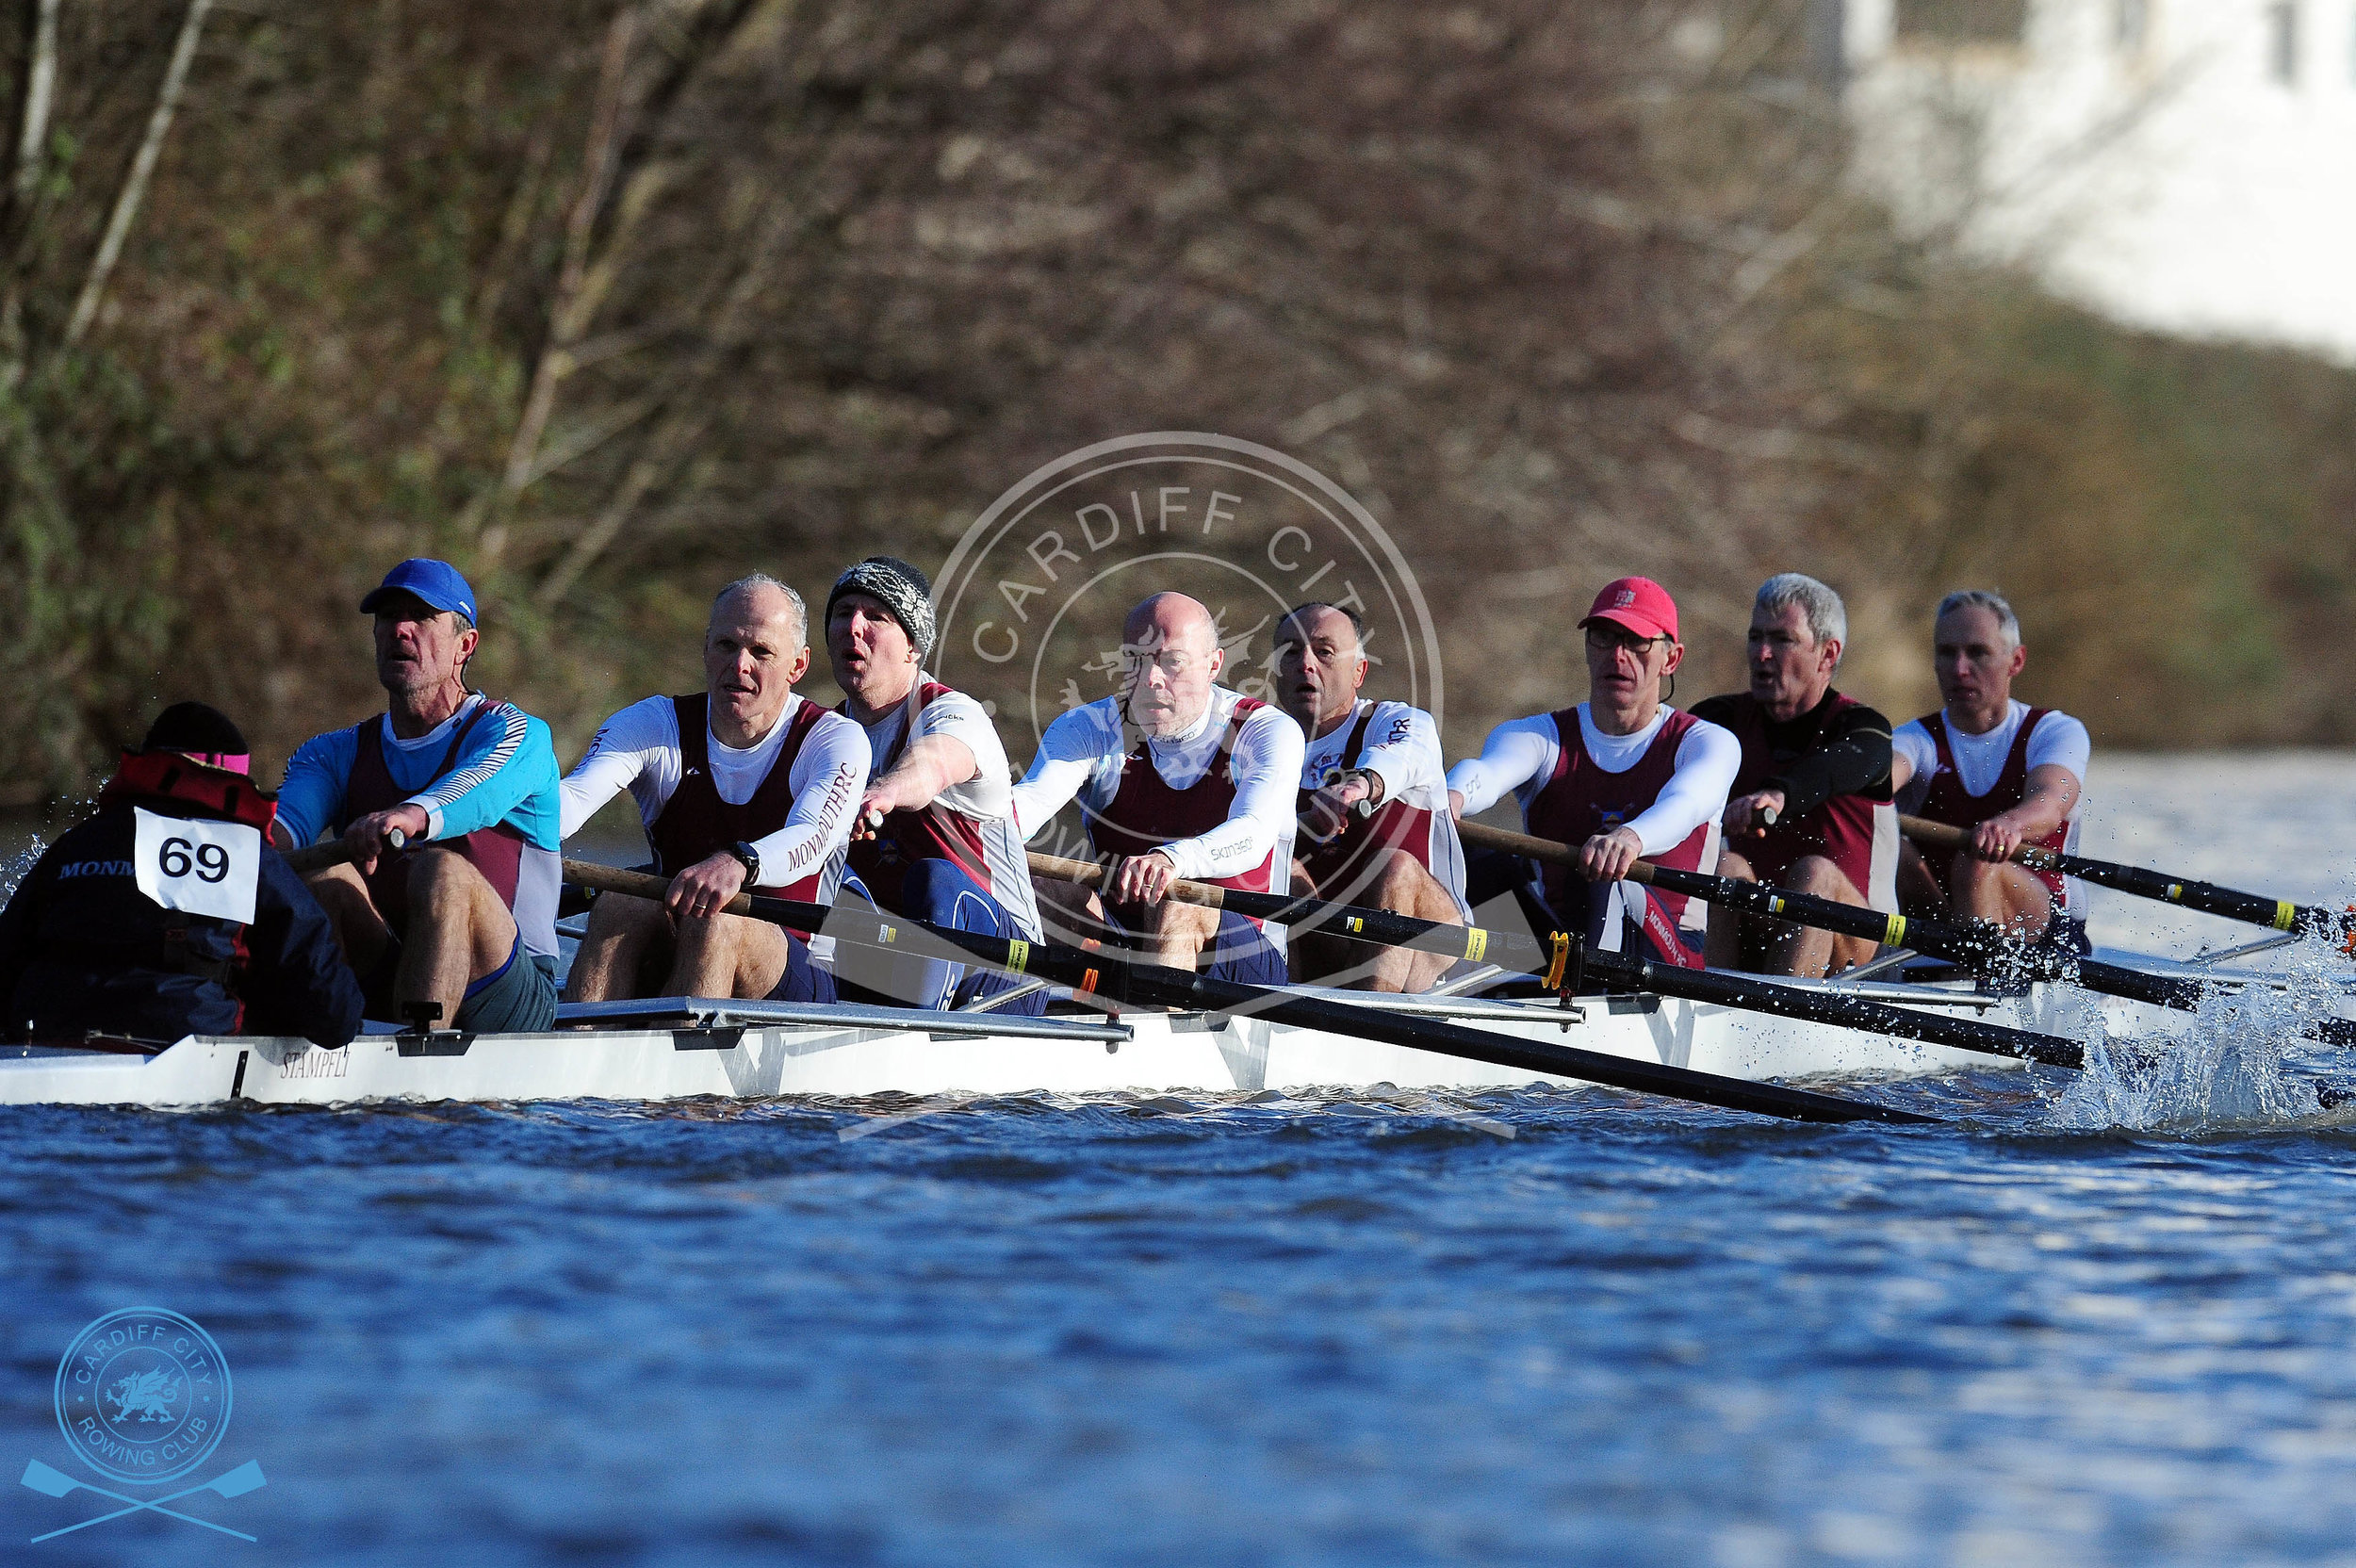 DW_280119_Cardiff_City_Rowing_236.jpg